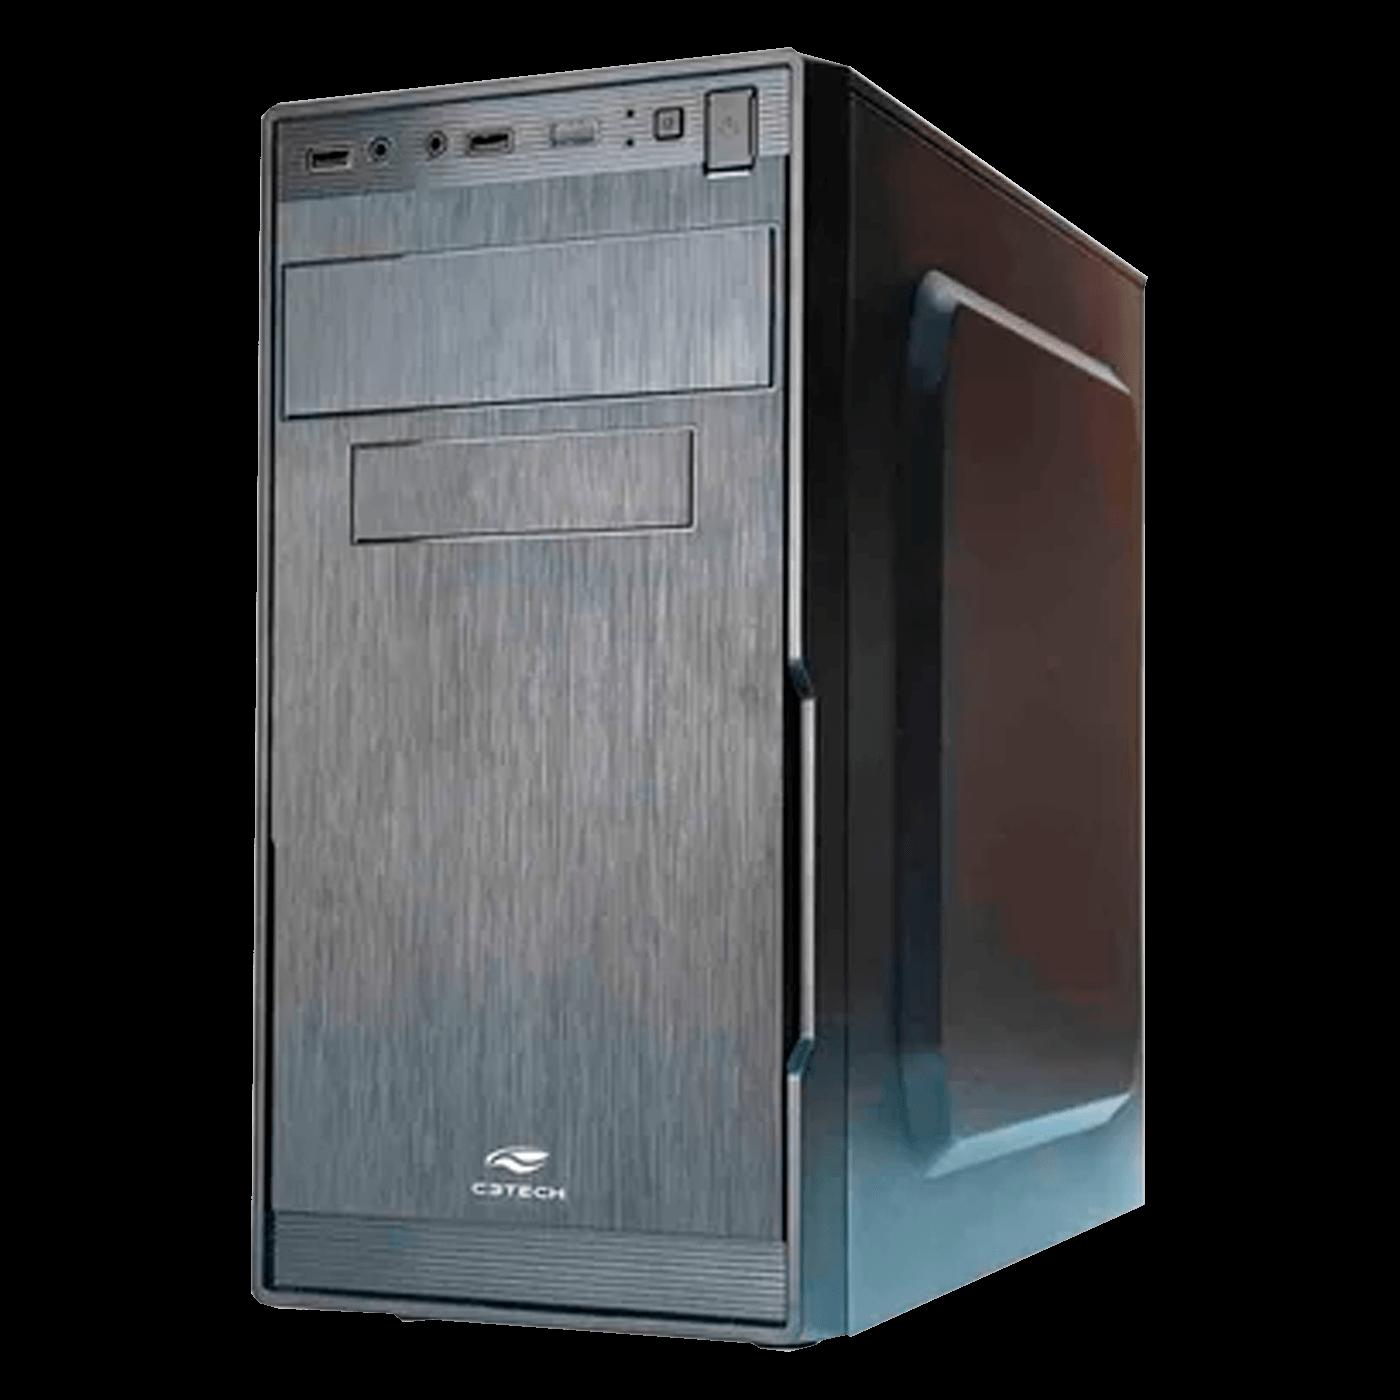 Gabinete ATX sem Fonte Gamer Preto C3tech - MT-G660BK